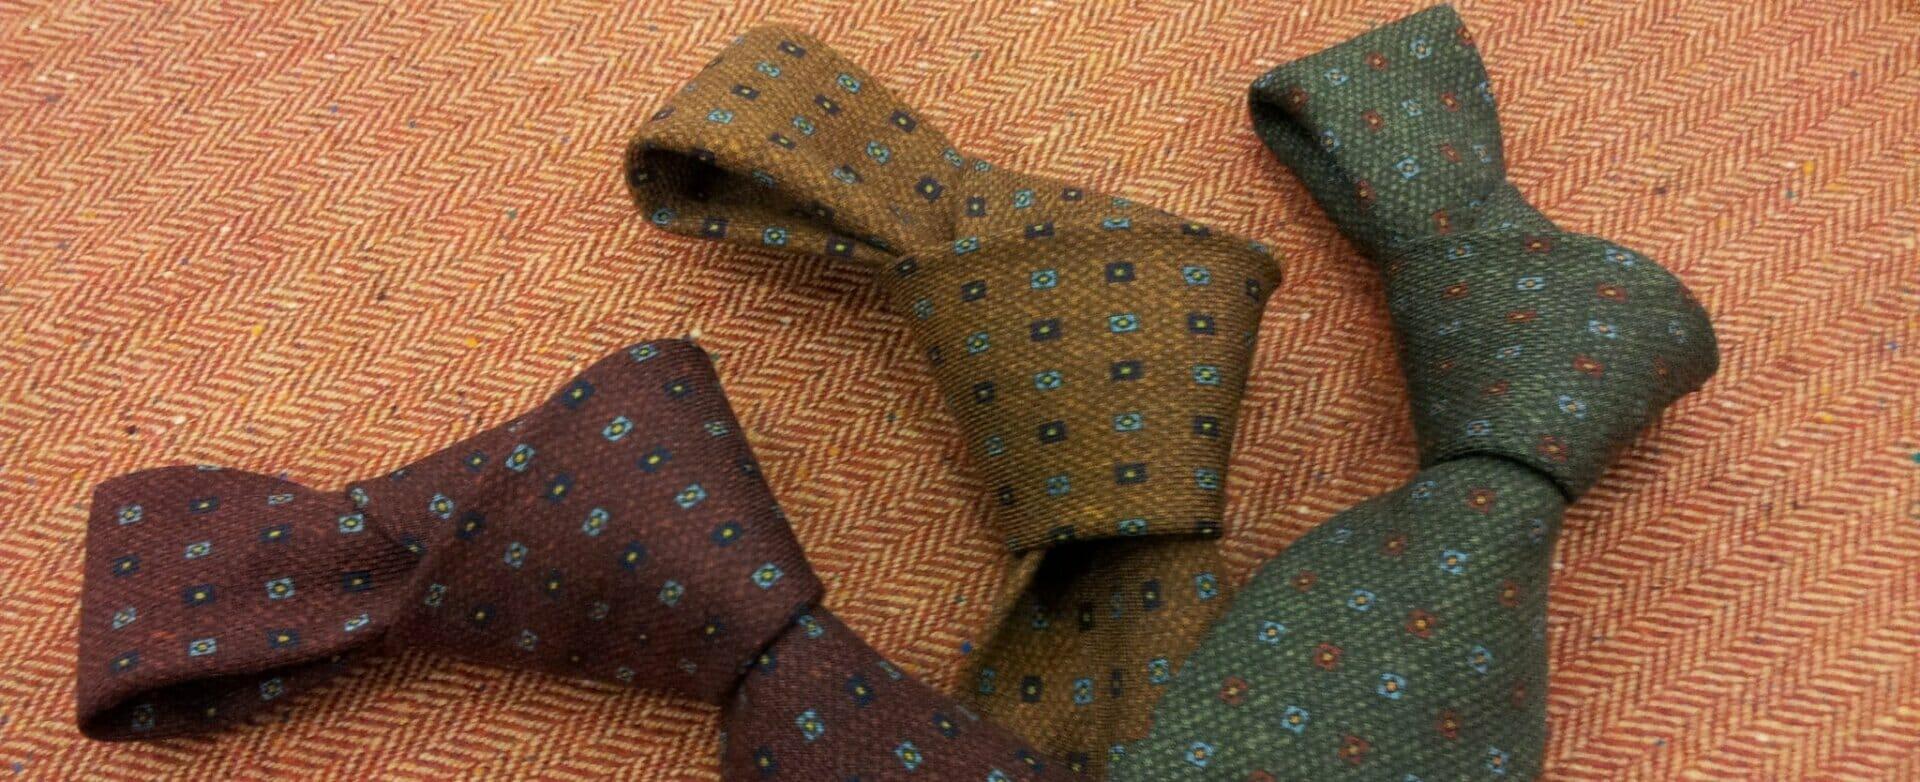 Cravatte Sartoriali in lana e seta ~ Sartoria Scavelli Roma